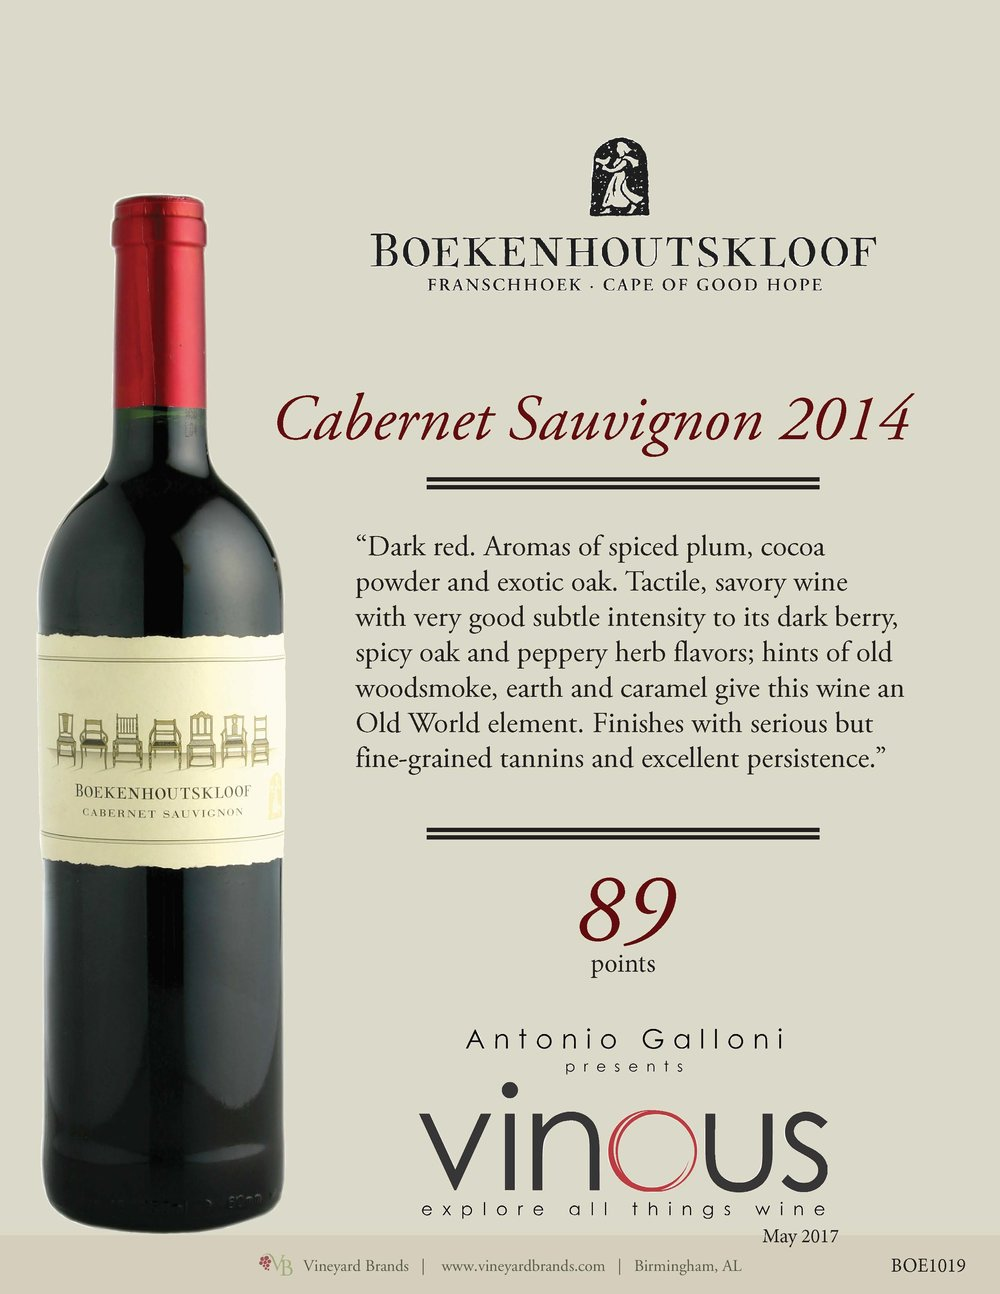 Boekenhoutskloof Cabernet Sauvignon 2014 2.jpg